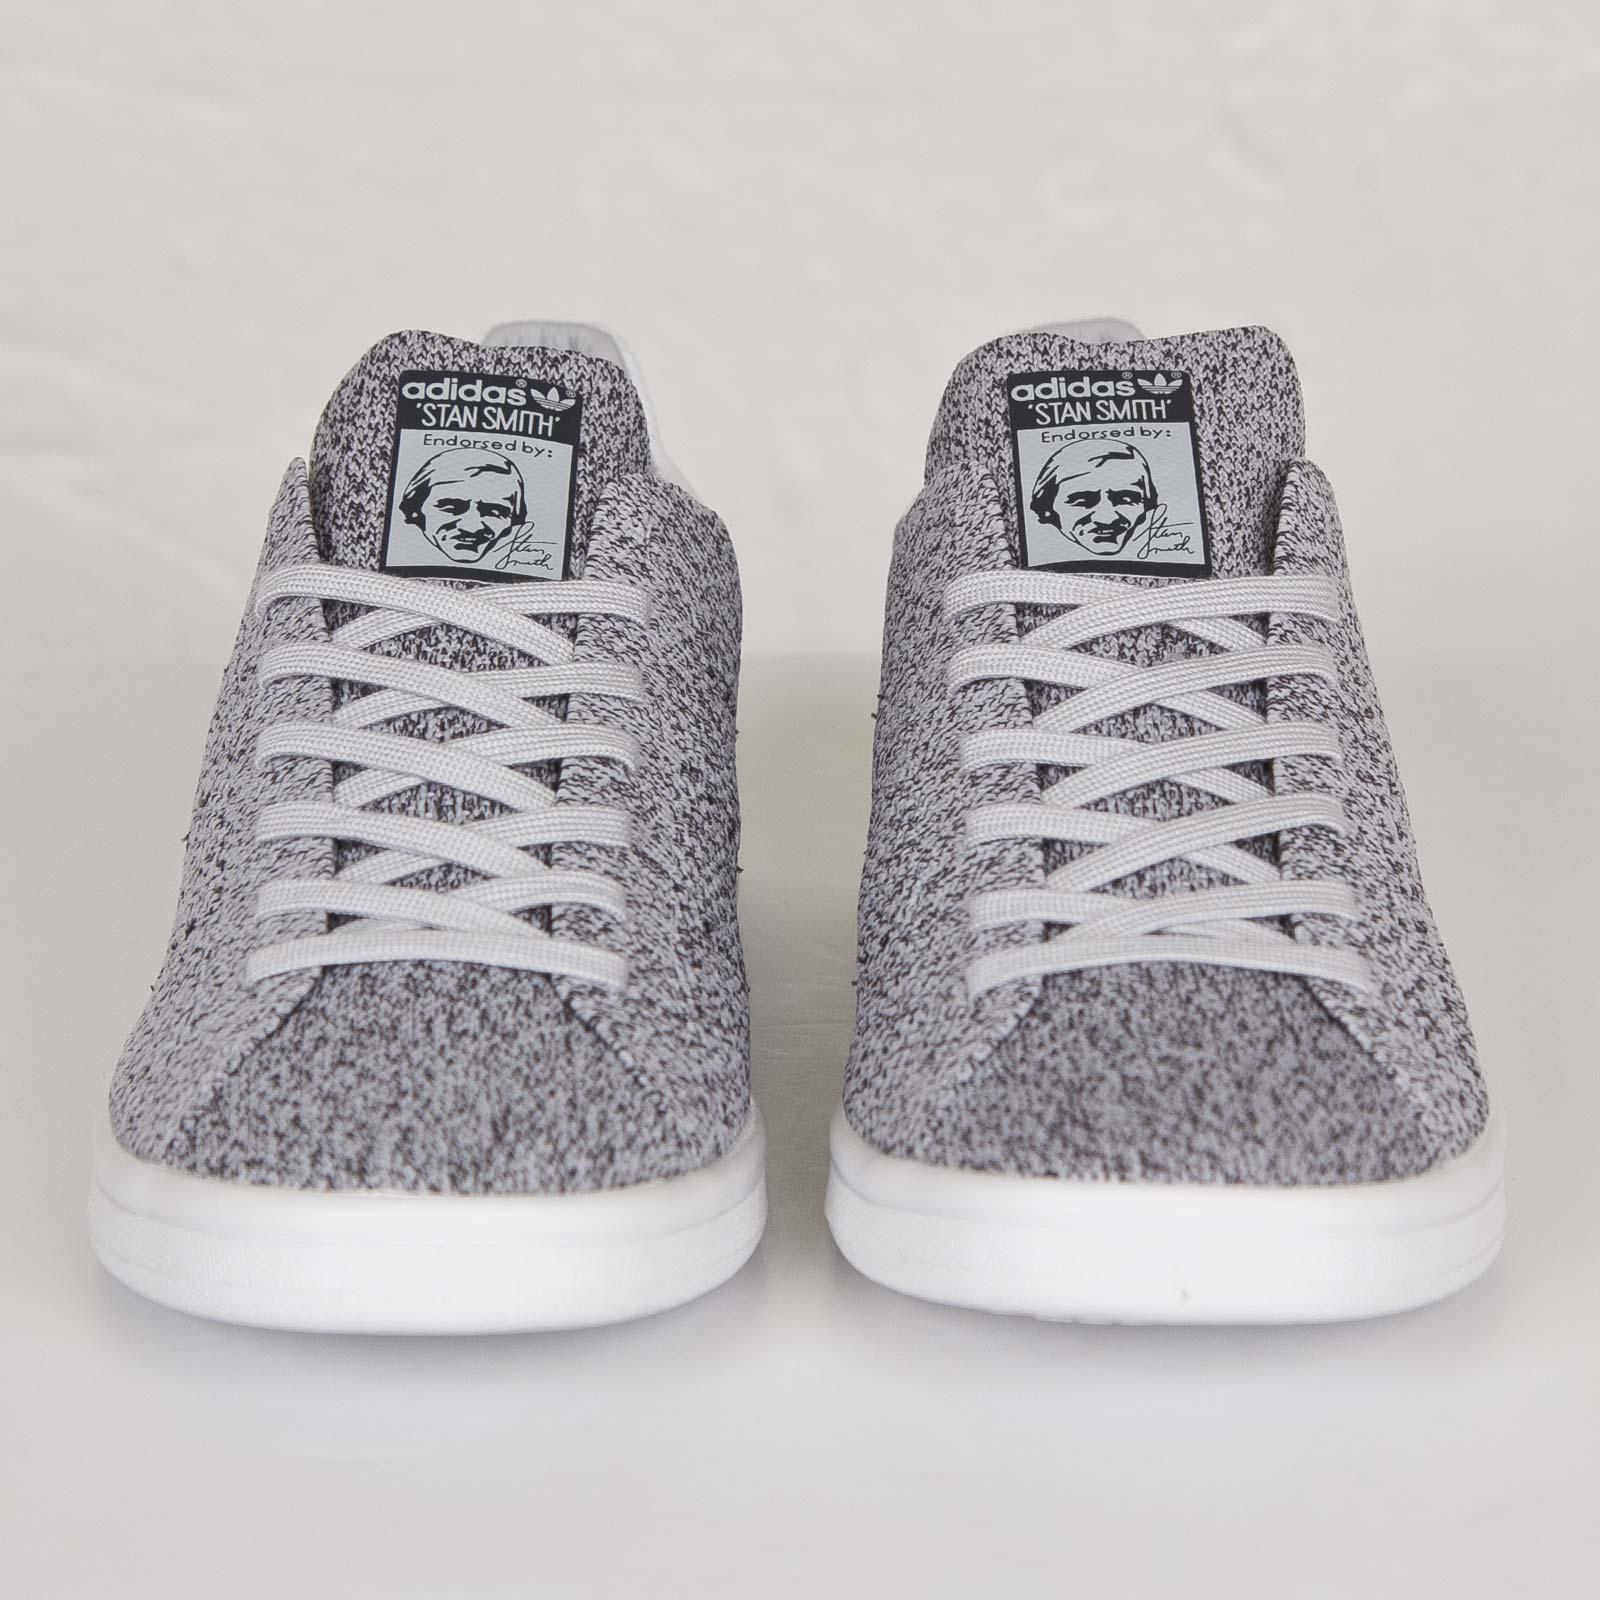 uk availability 36097 db9e1 adidas Stan Smith Primeknit NM - B27152 - Sneakersnstuff ...